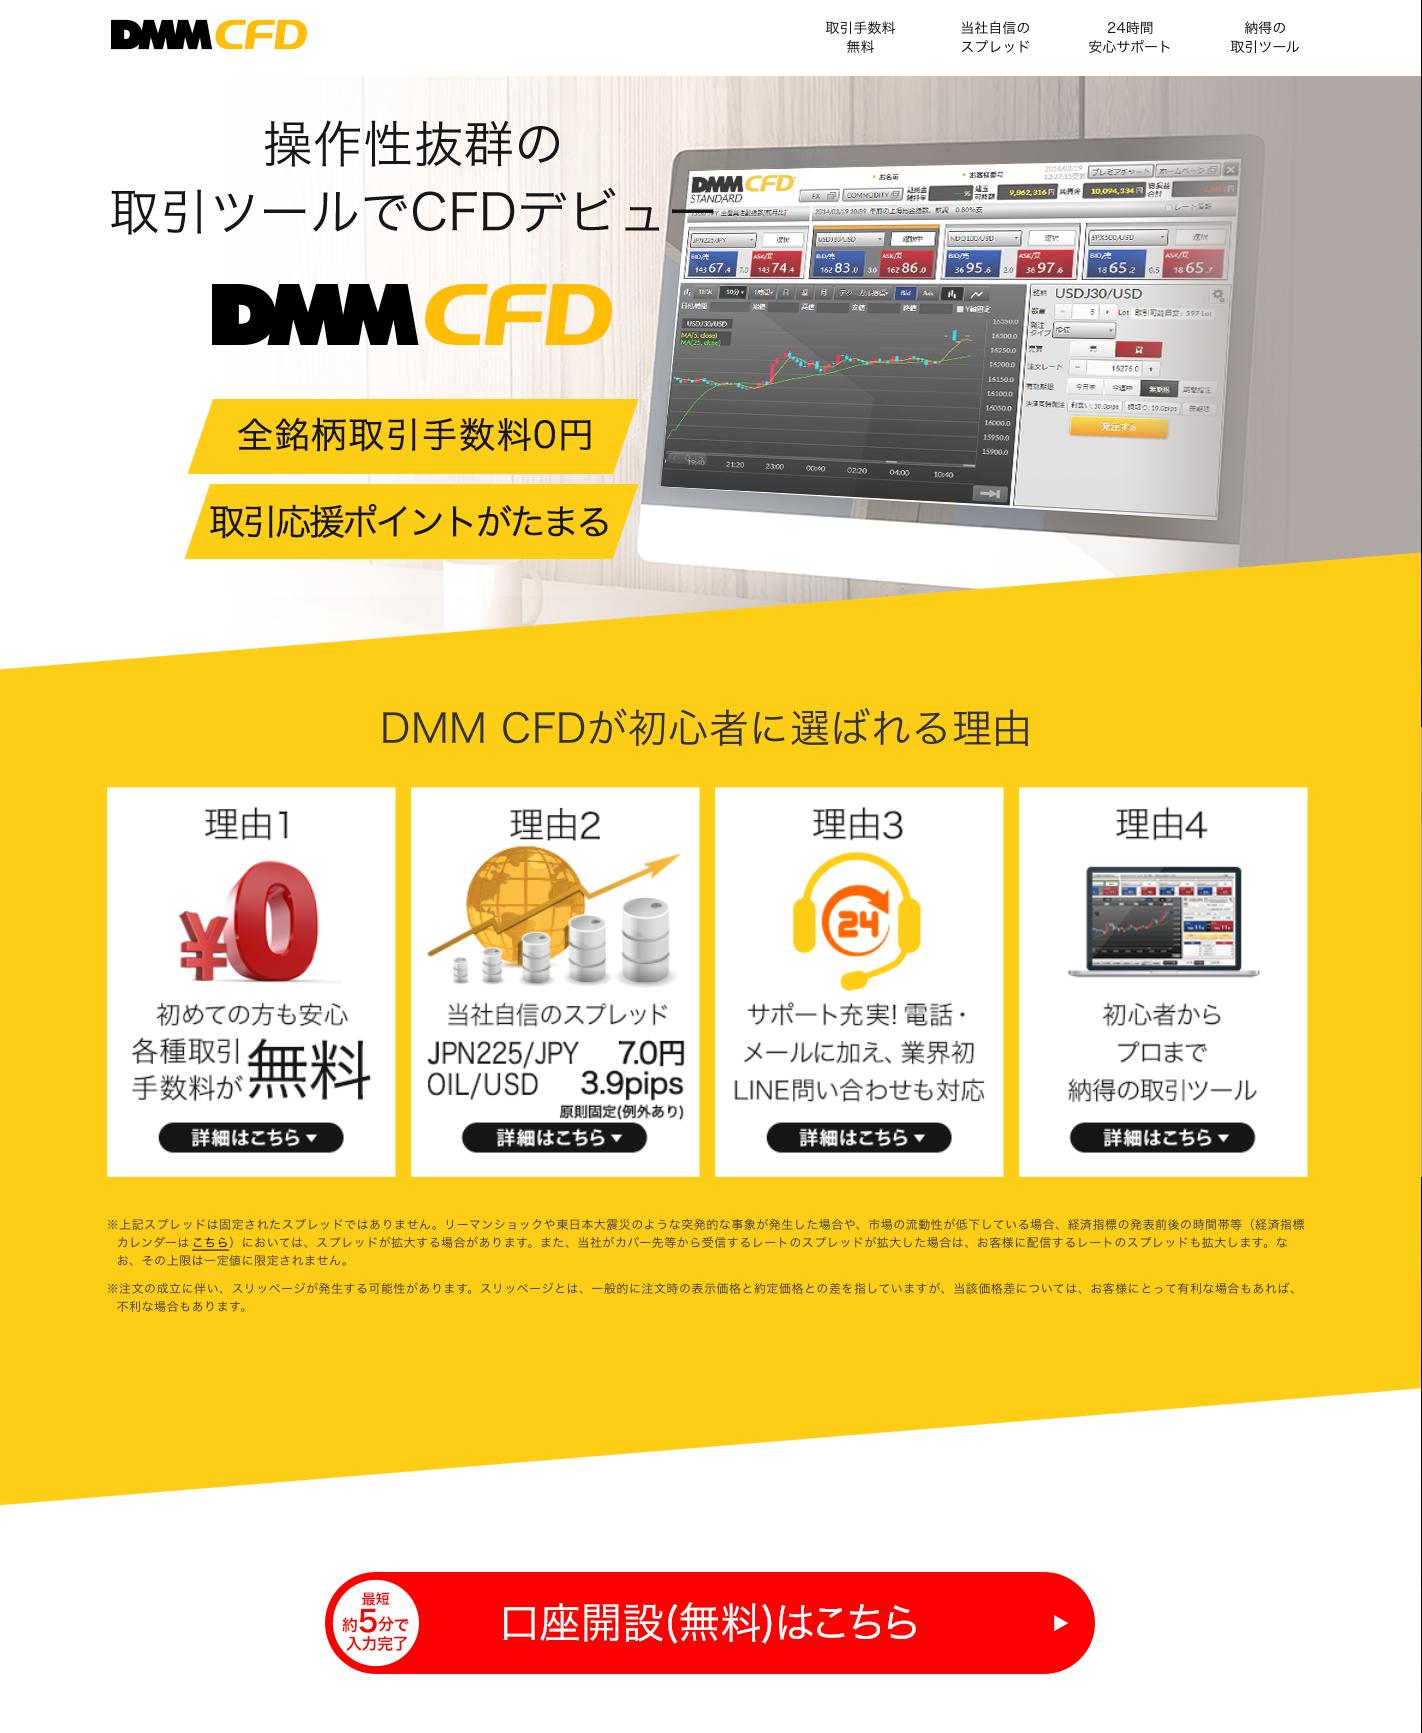 MMDCFDの広告ページ